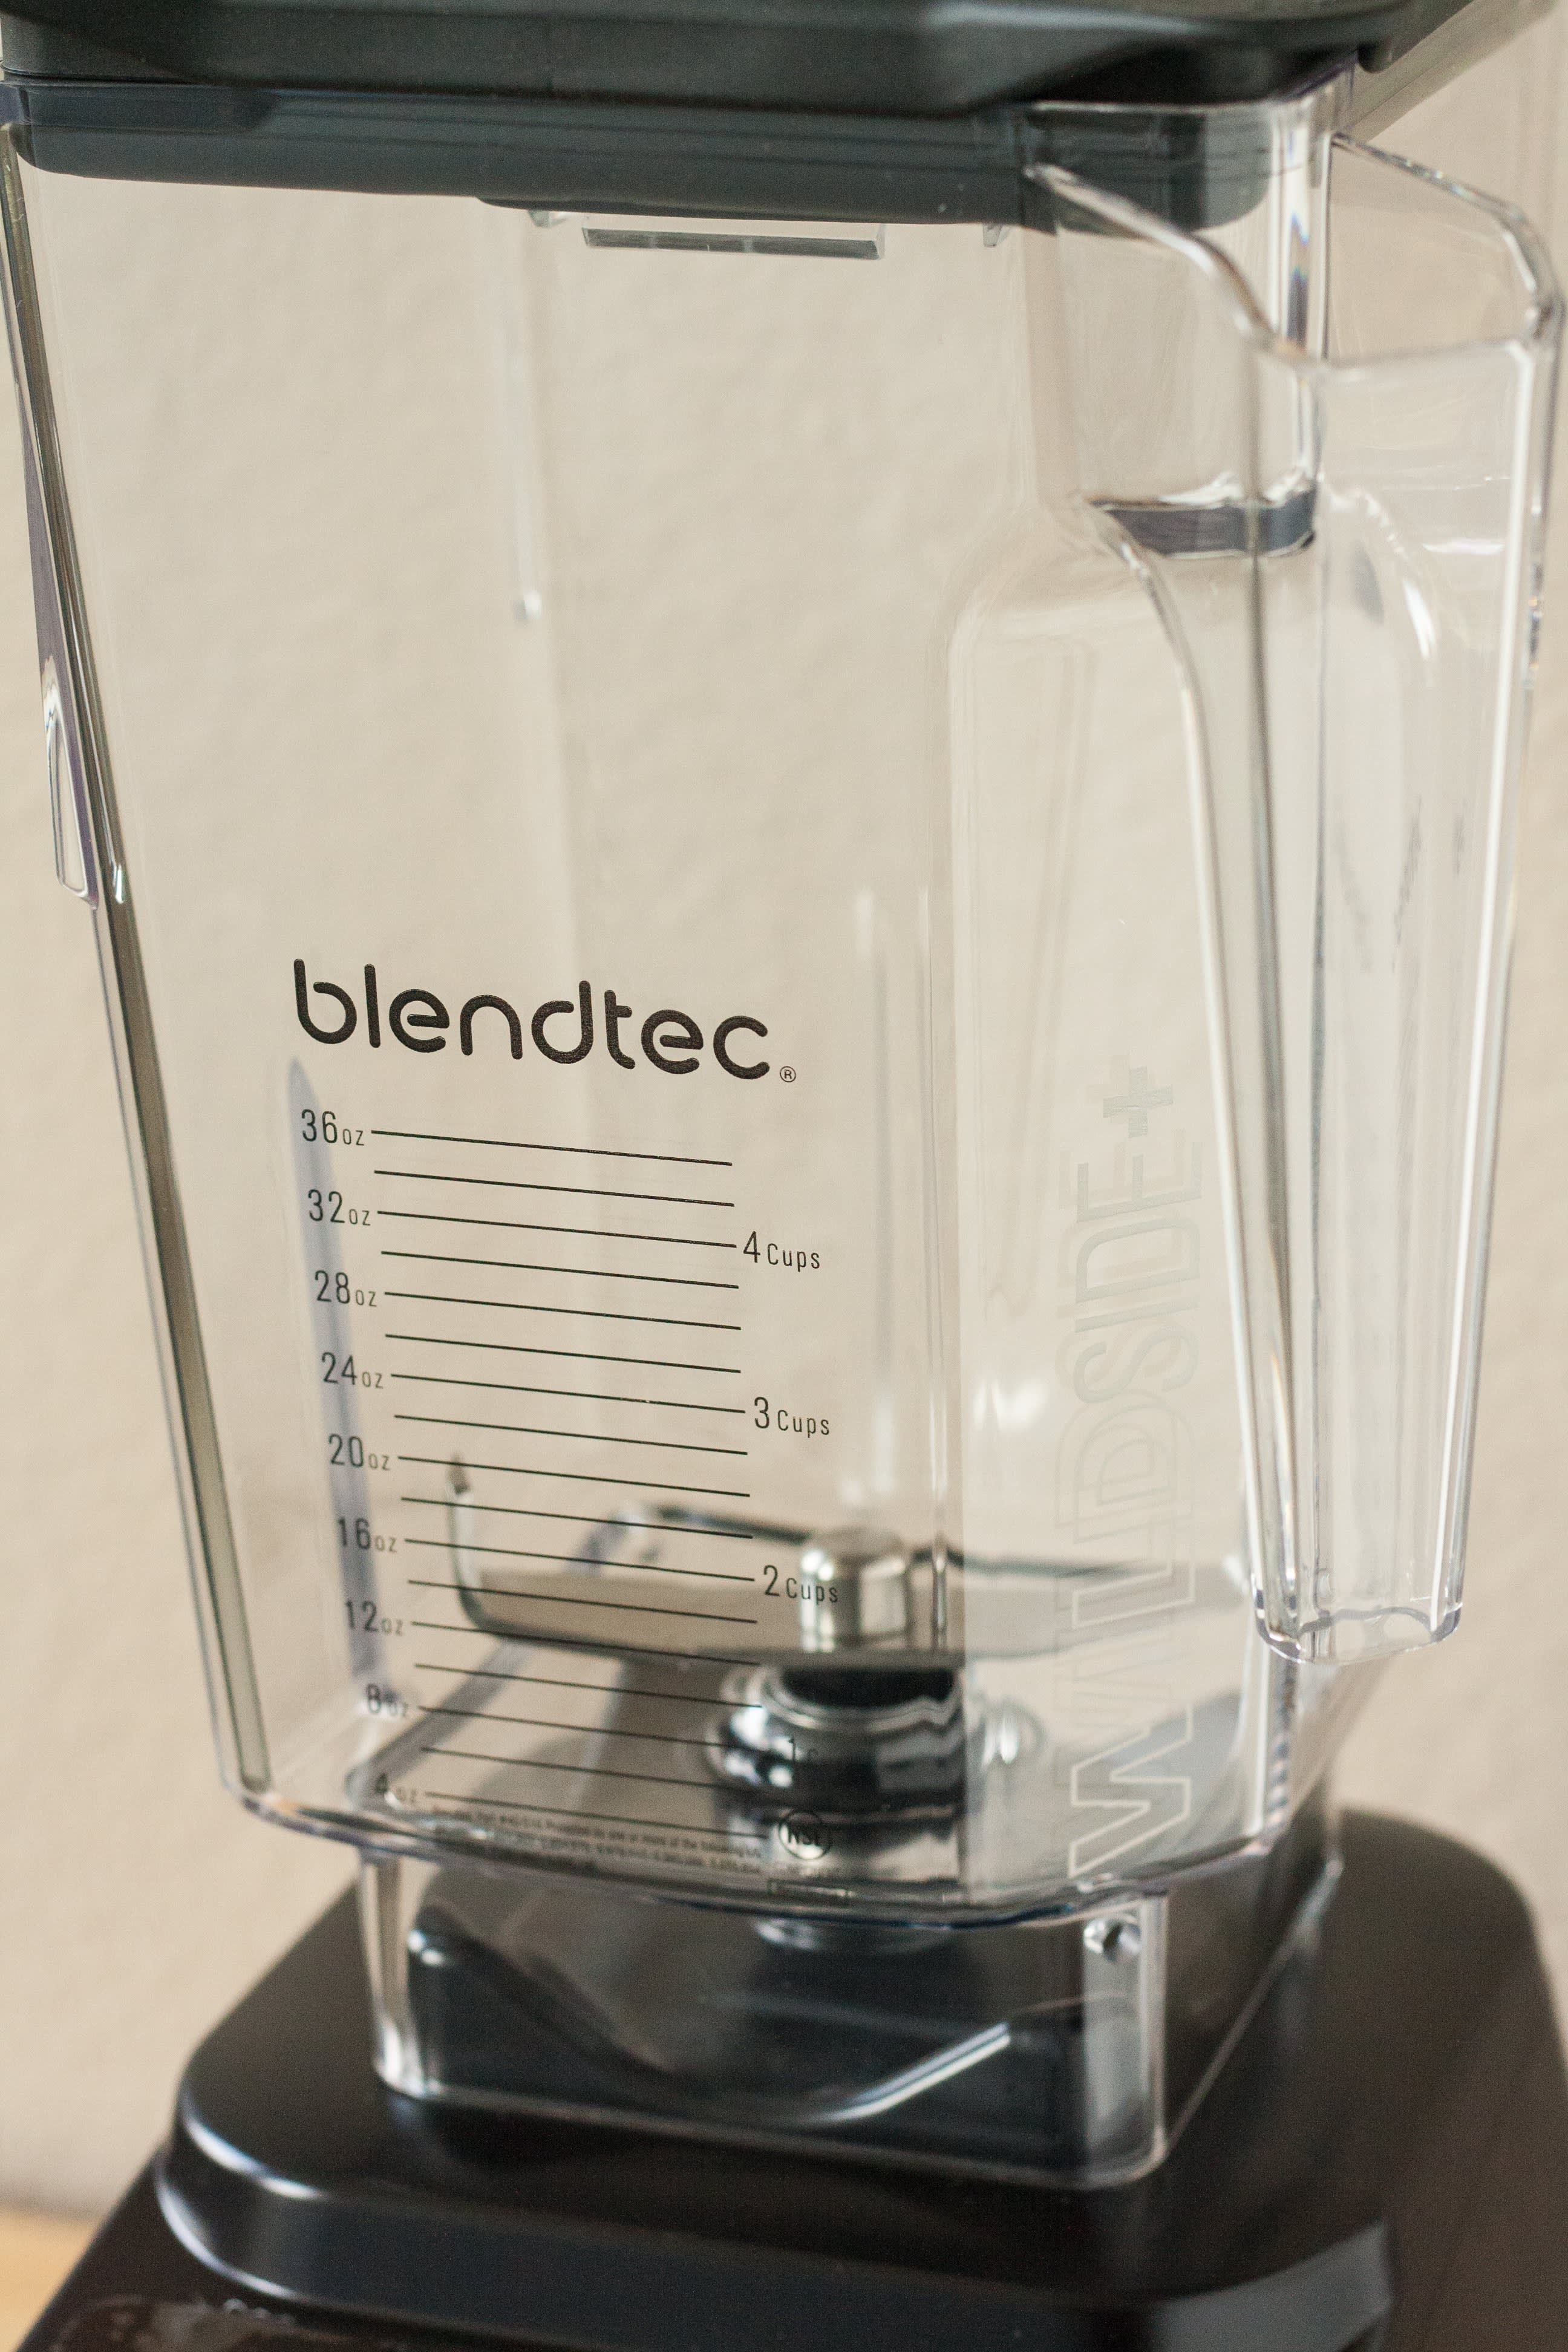 The Blendtec Designer 625 Blender Makes Blending Stylish and Easy: gallery image 2